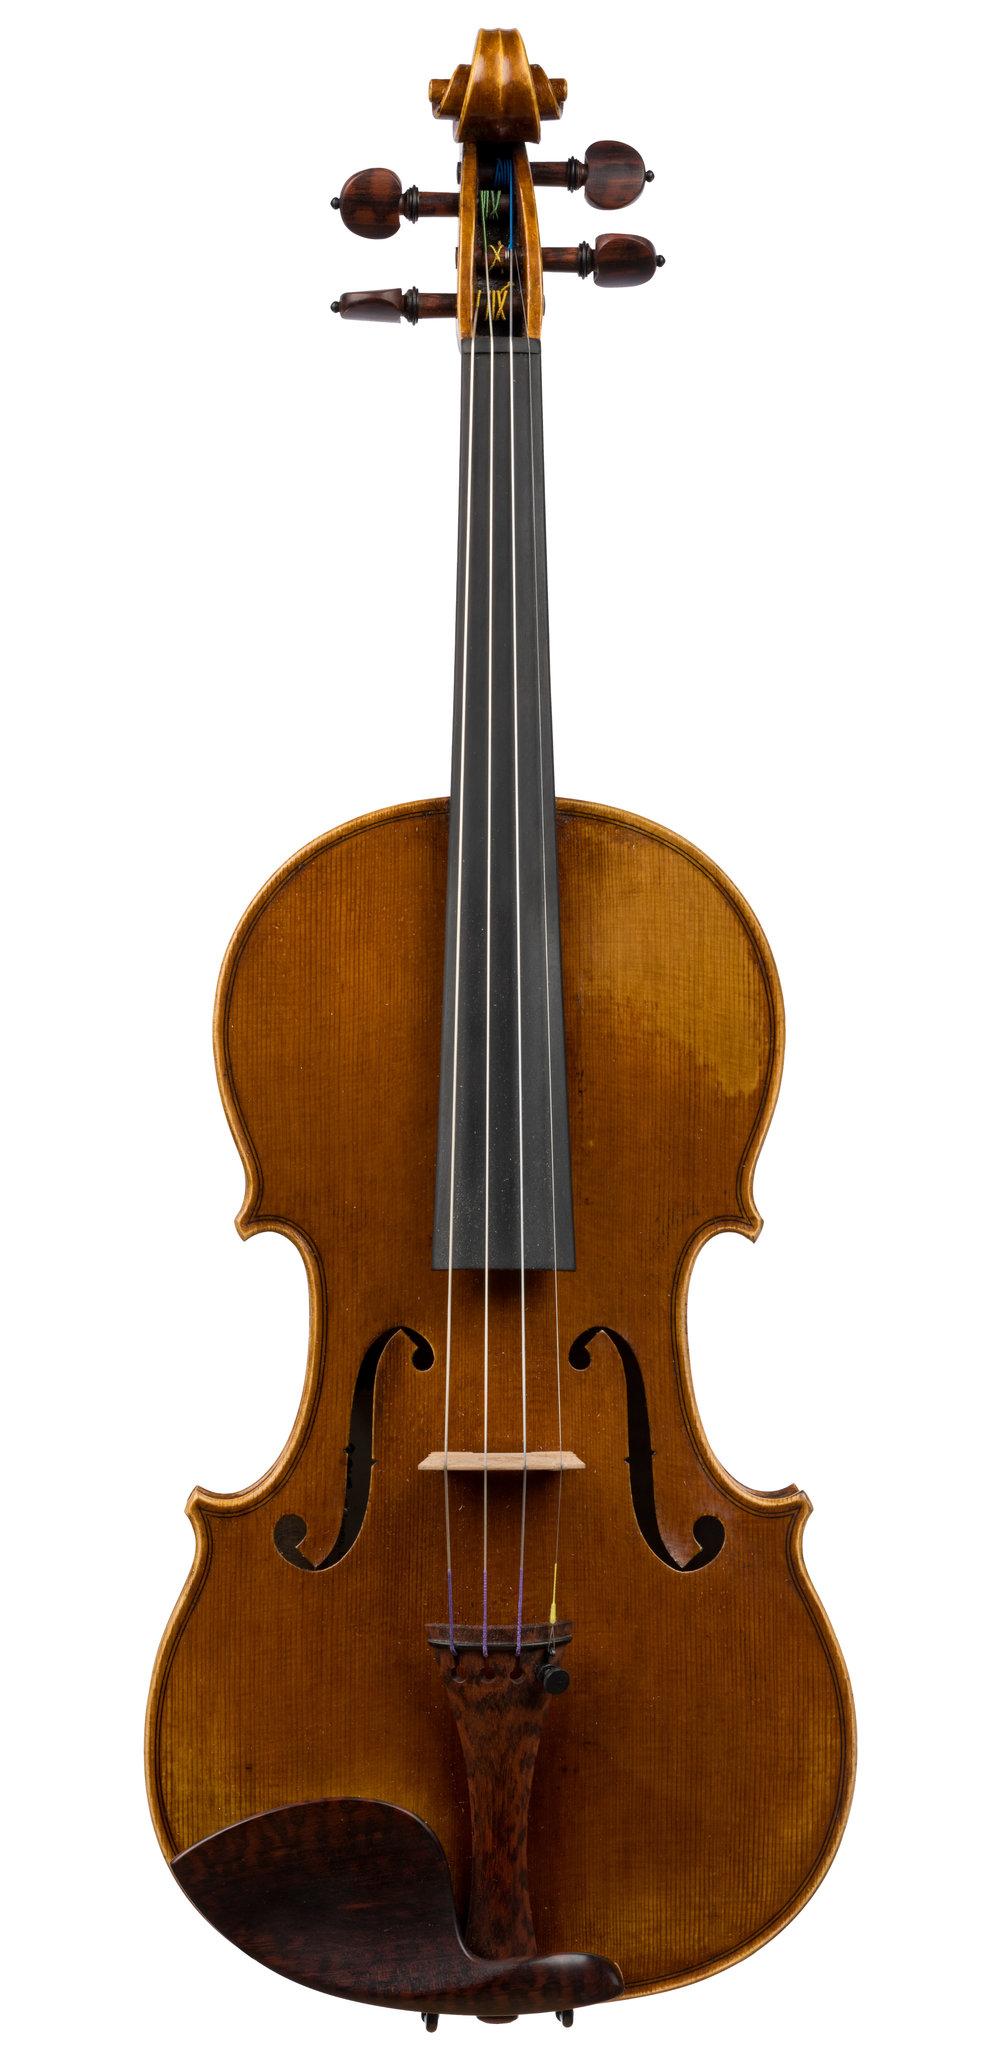 Drew Harding violin, Chicago, 2018 -